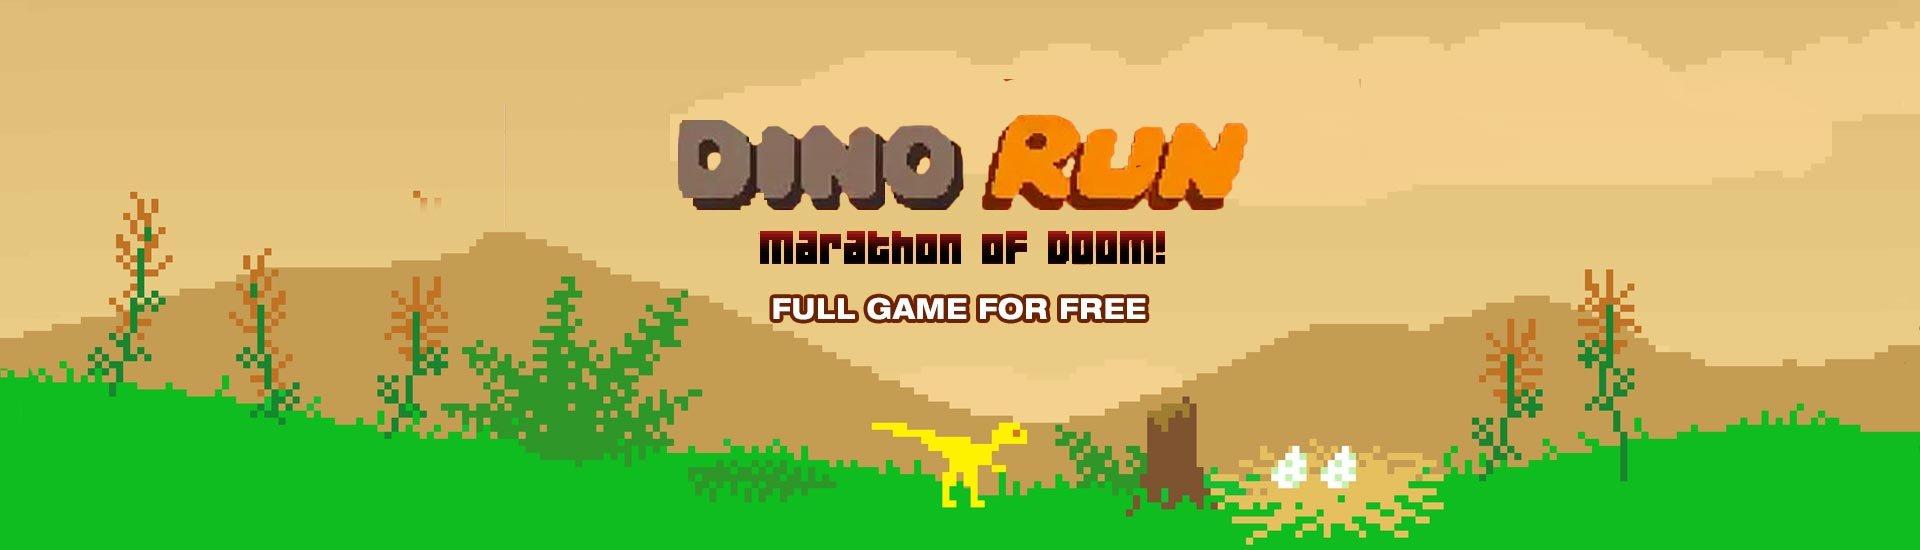 Dino Run: Marathon of Doom cover